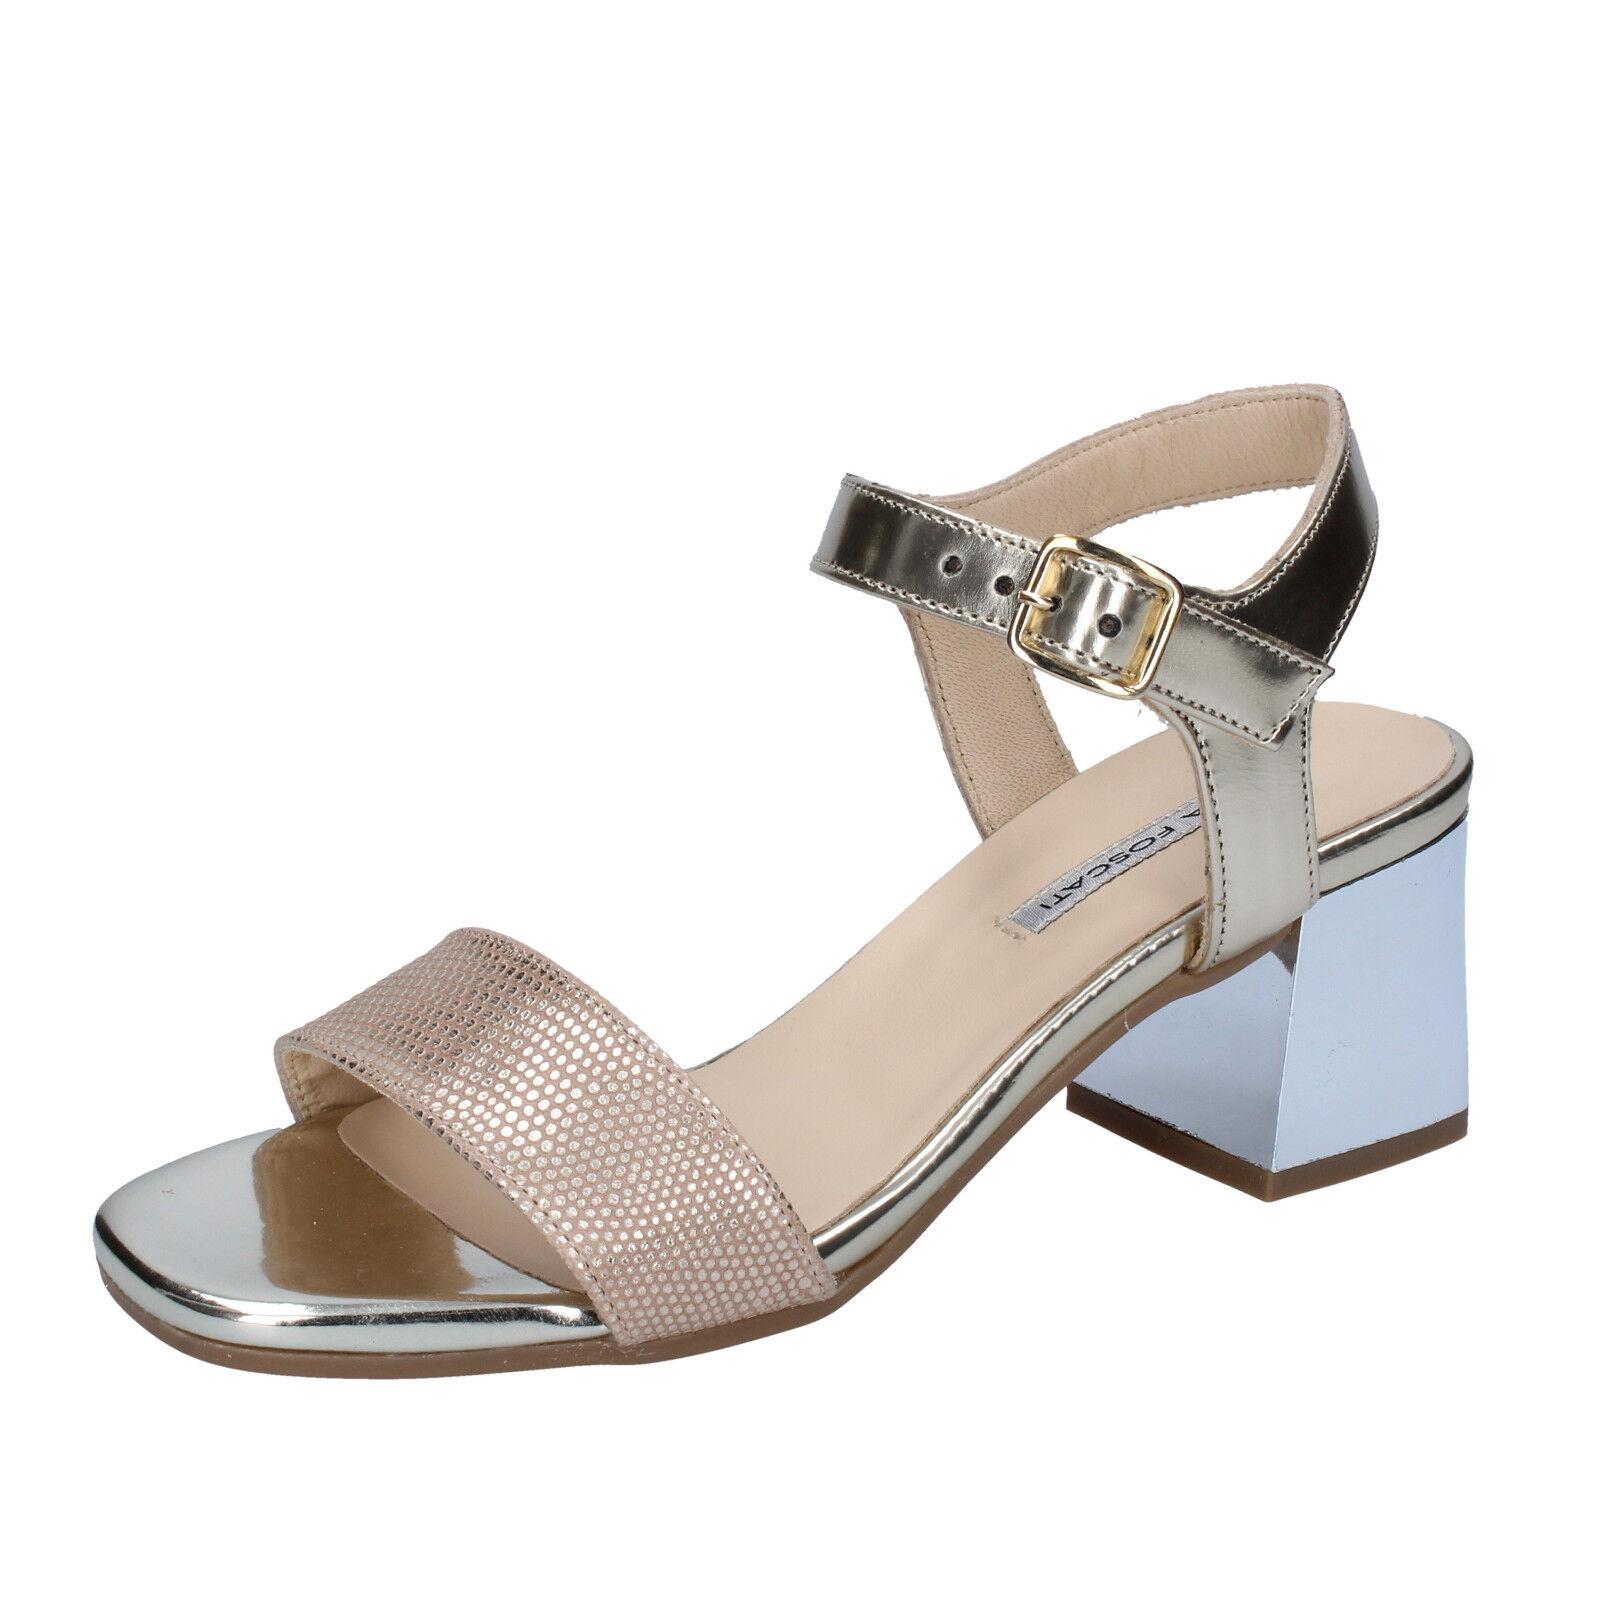 Scarpe donna LEA platino FOSCATI 35 EU sandali platino LEA pelle lucida BZ658-B f3f7c8